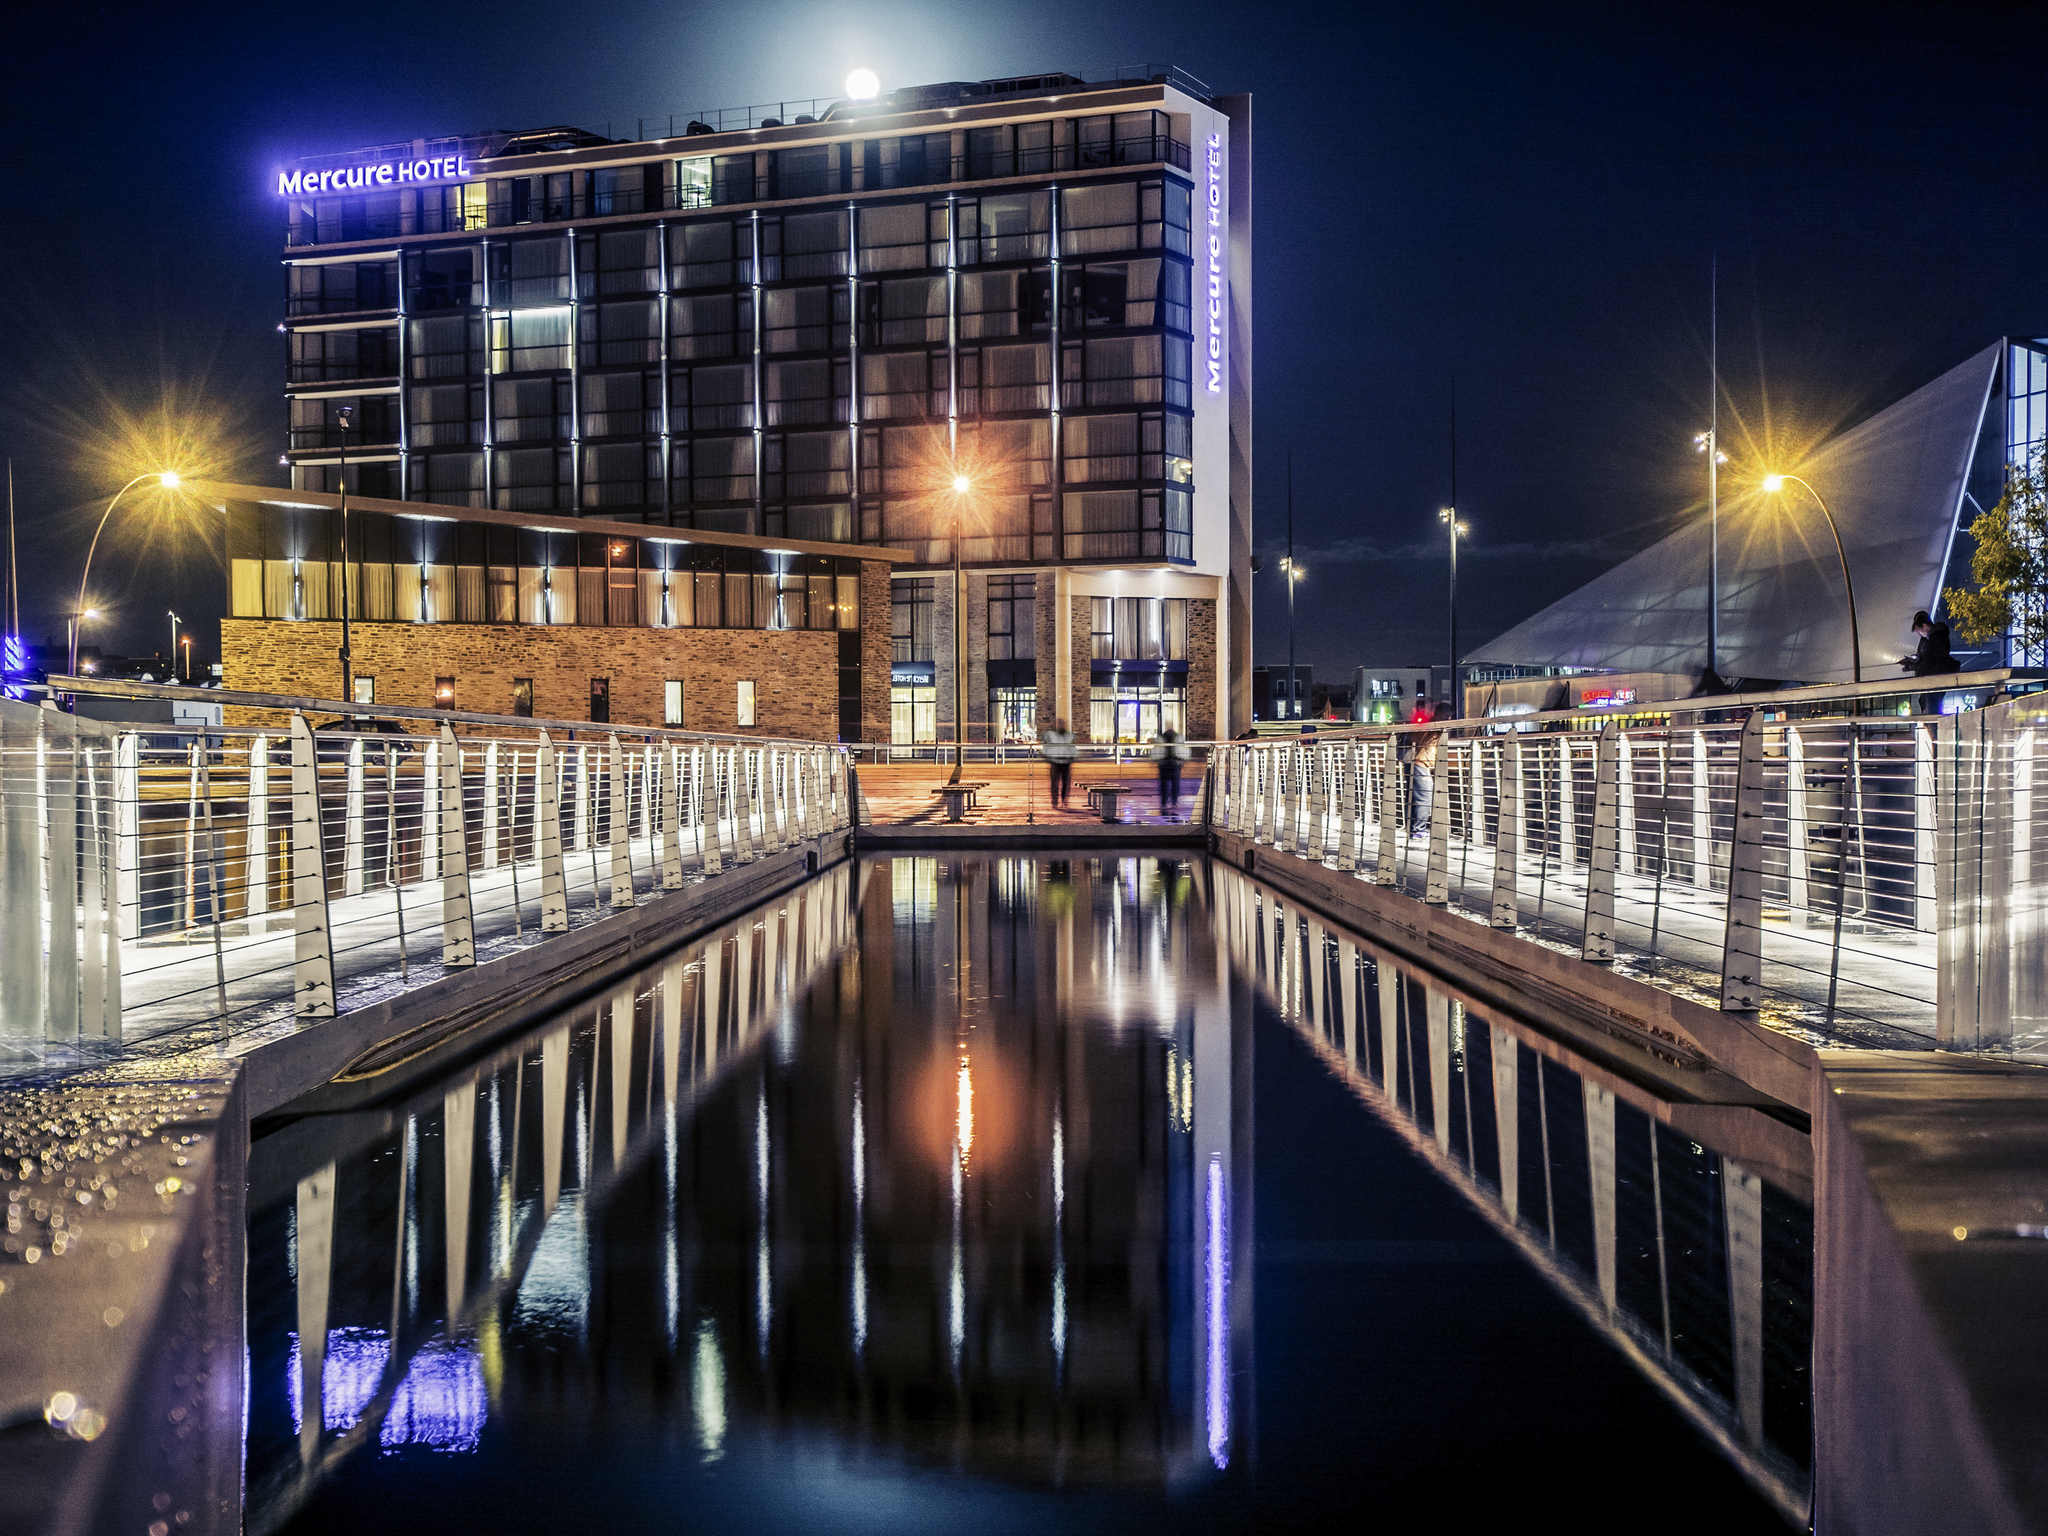 Hotel – Hotel Mercure Cherbourg Centre Port